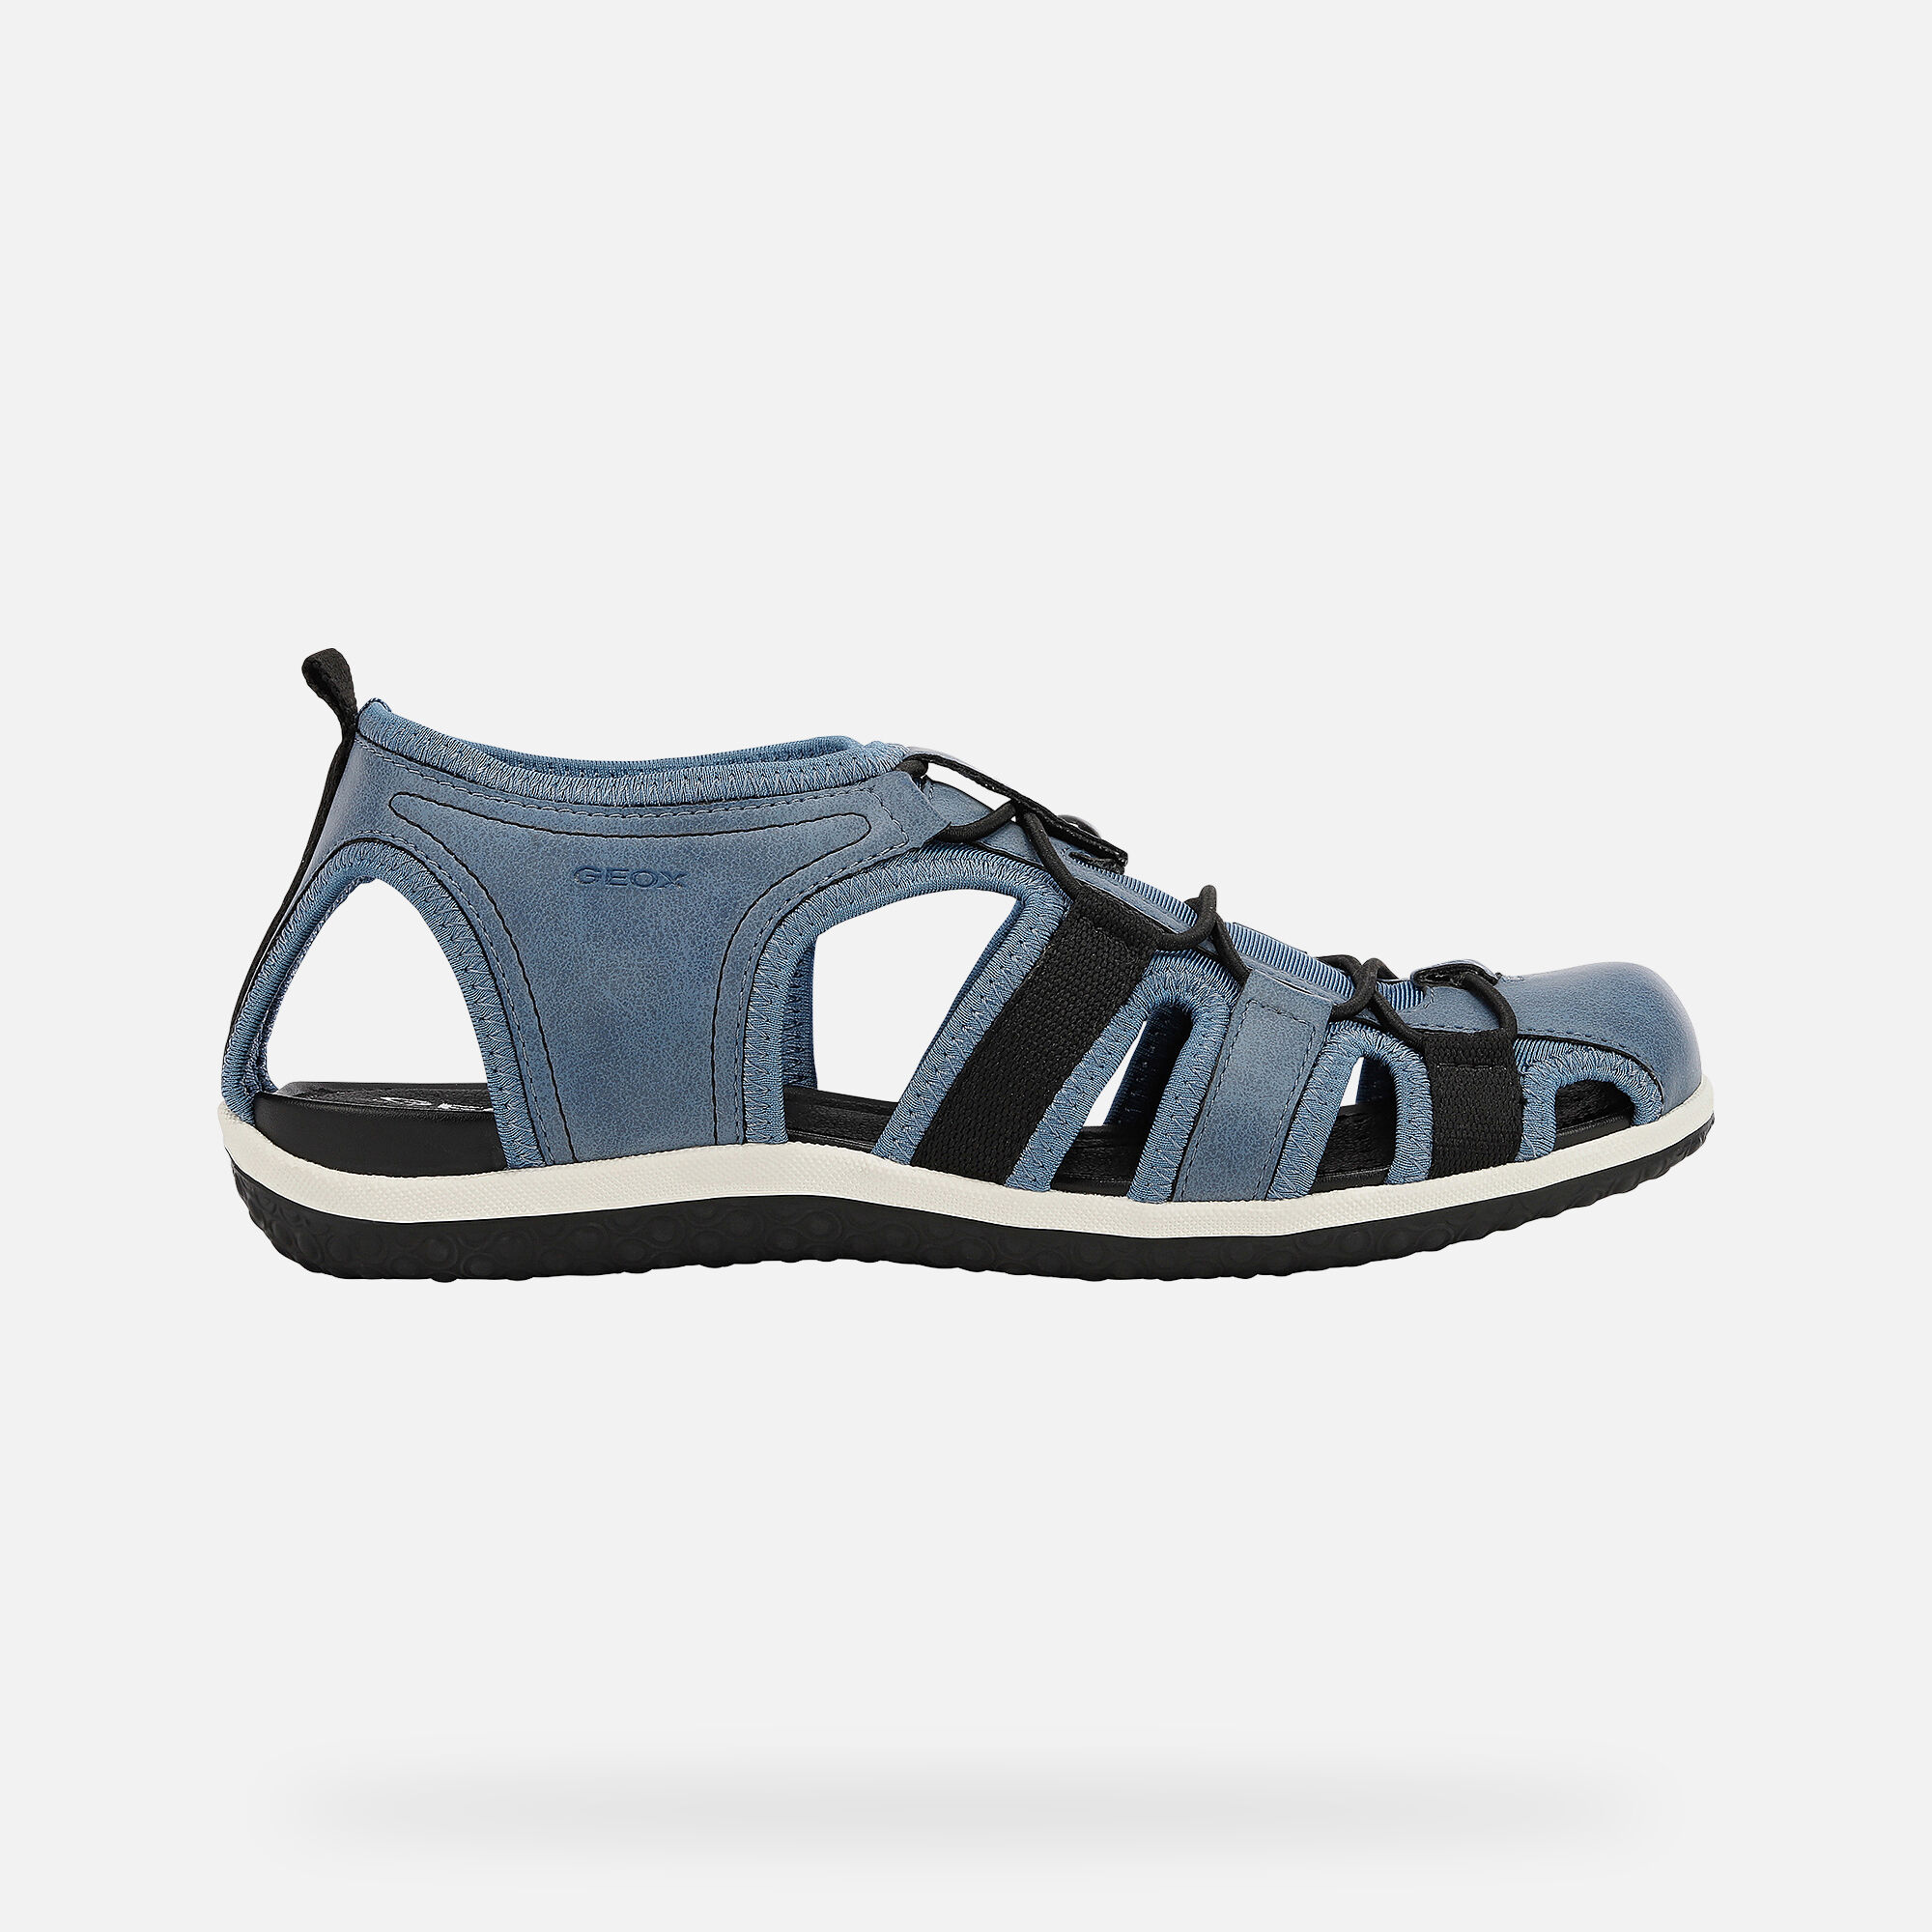 Geox VEGA DAME: Jeansblau Sandalen | Geox ® SS 20